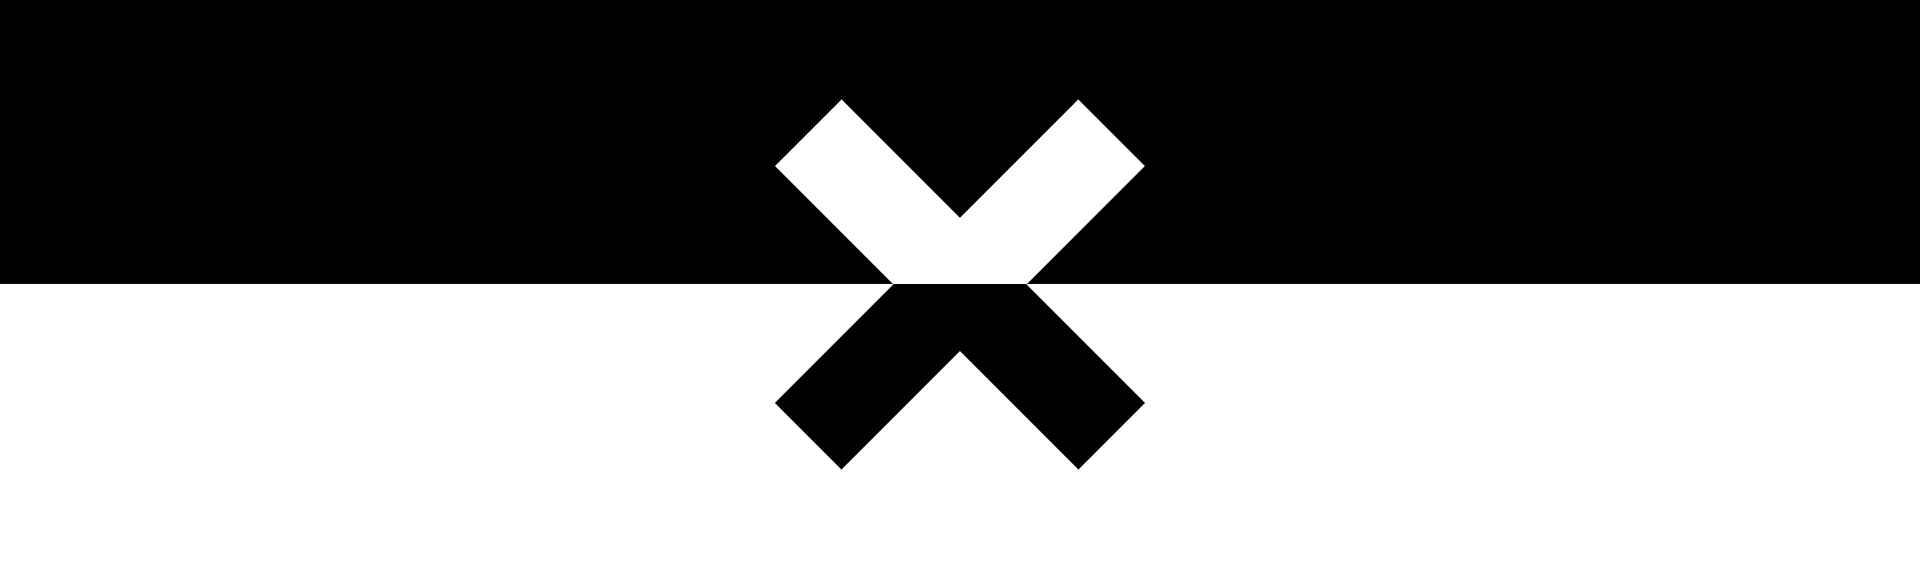 artfatale-bg-x-graphic